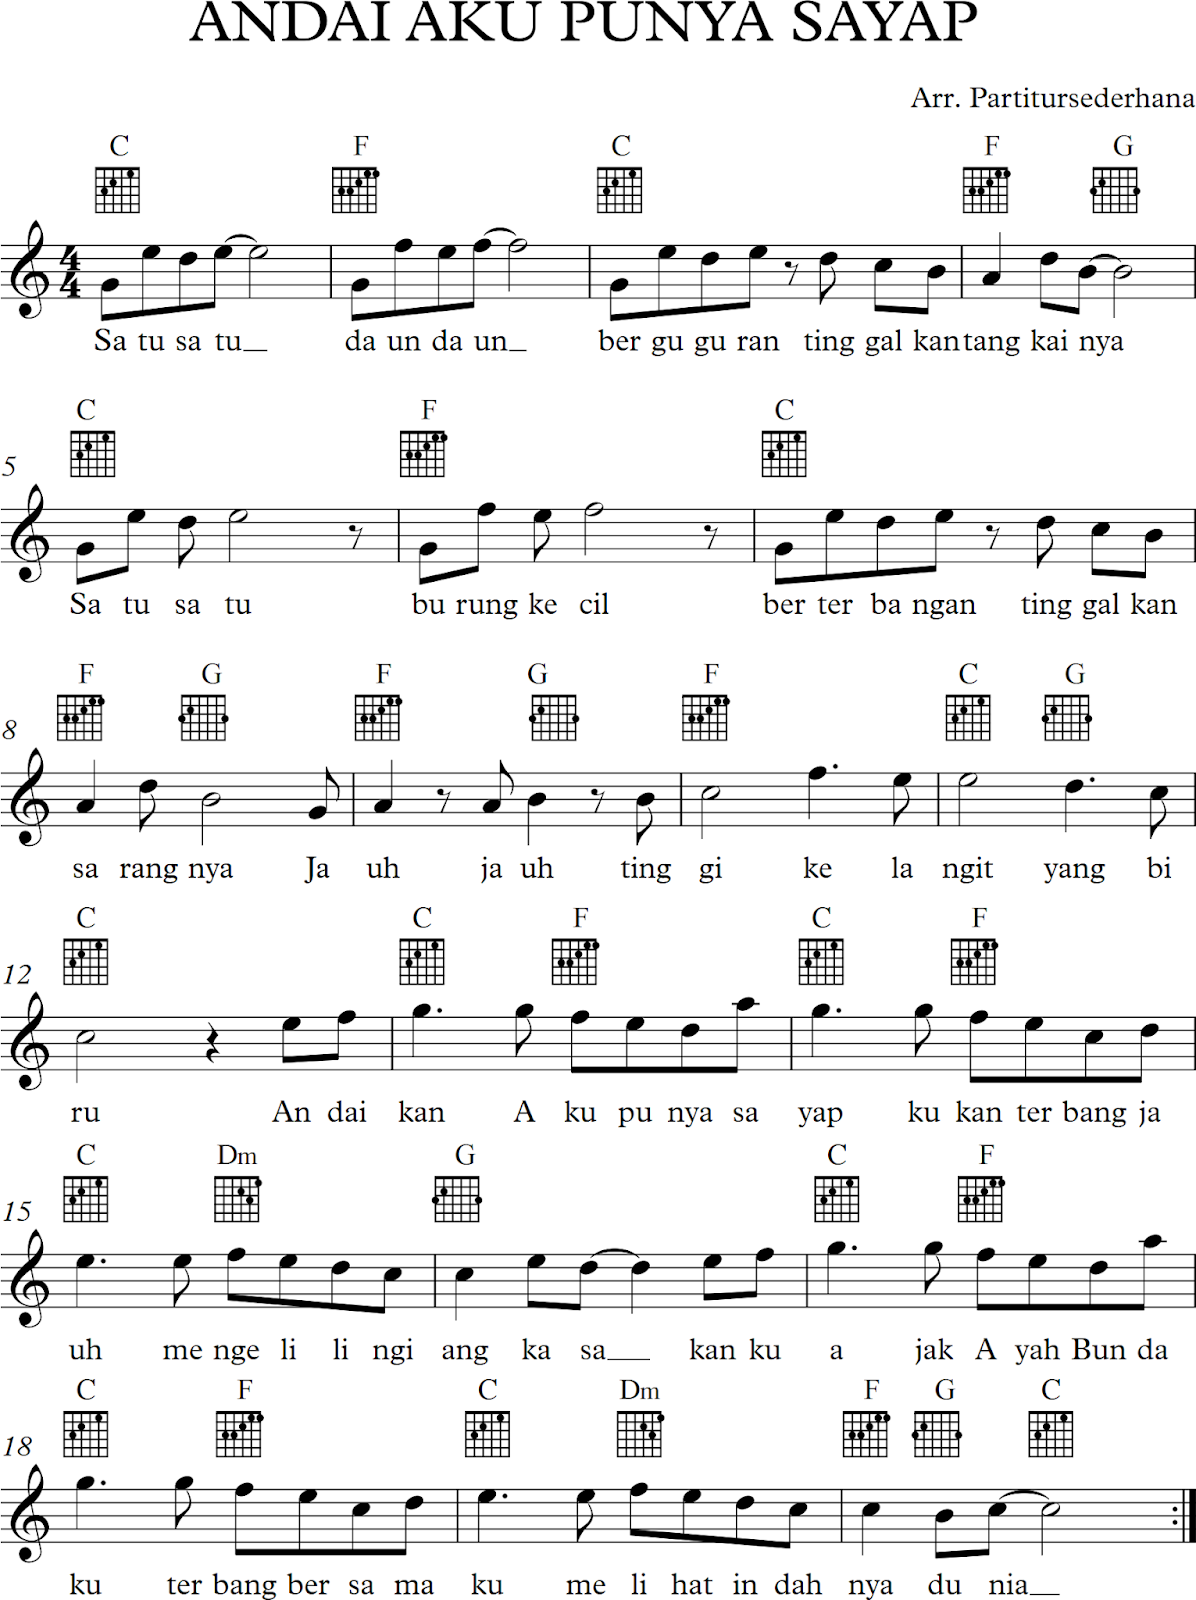 Chord Seandainya Aku Punya Sayap : chord, seandainya, punya, sayap, Andai, Punya, Sayap, Dengan